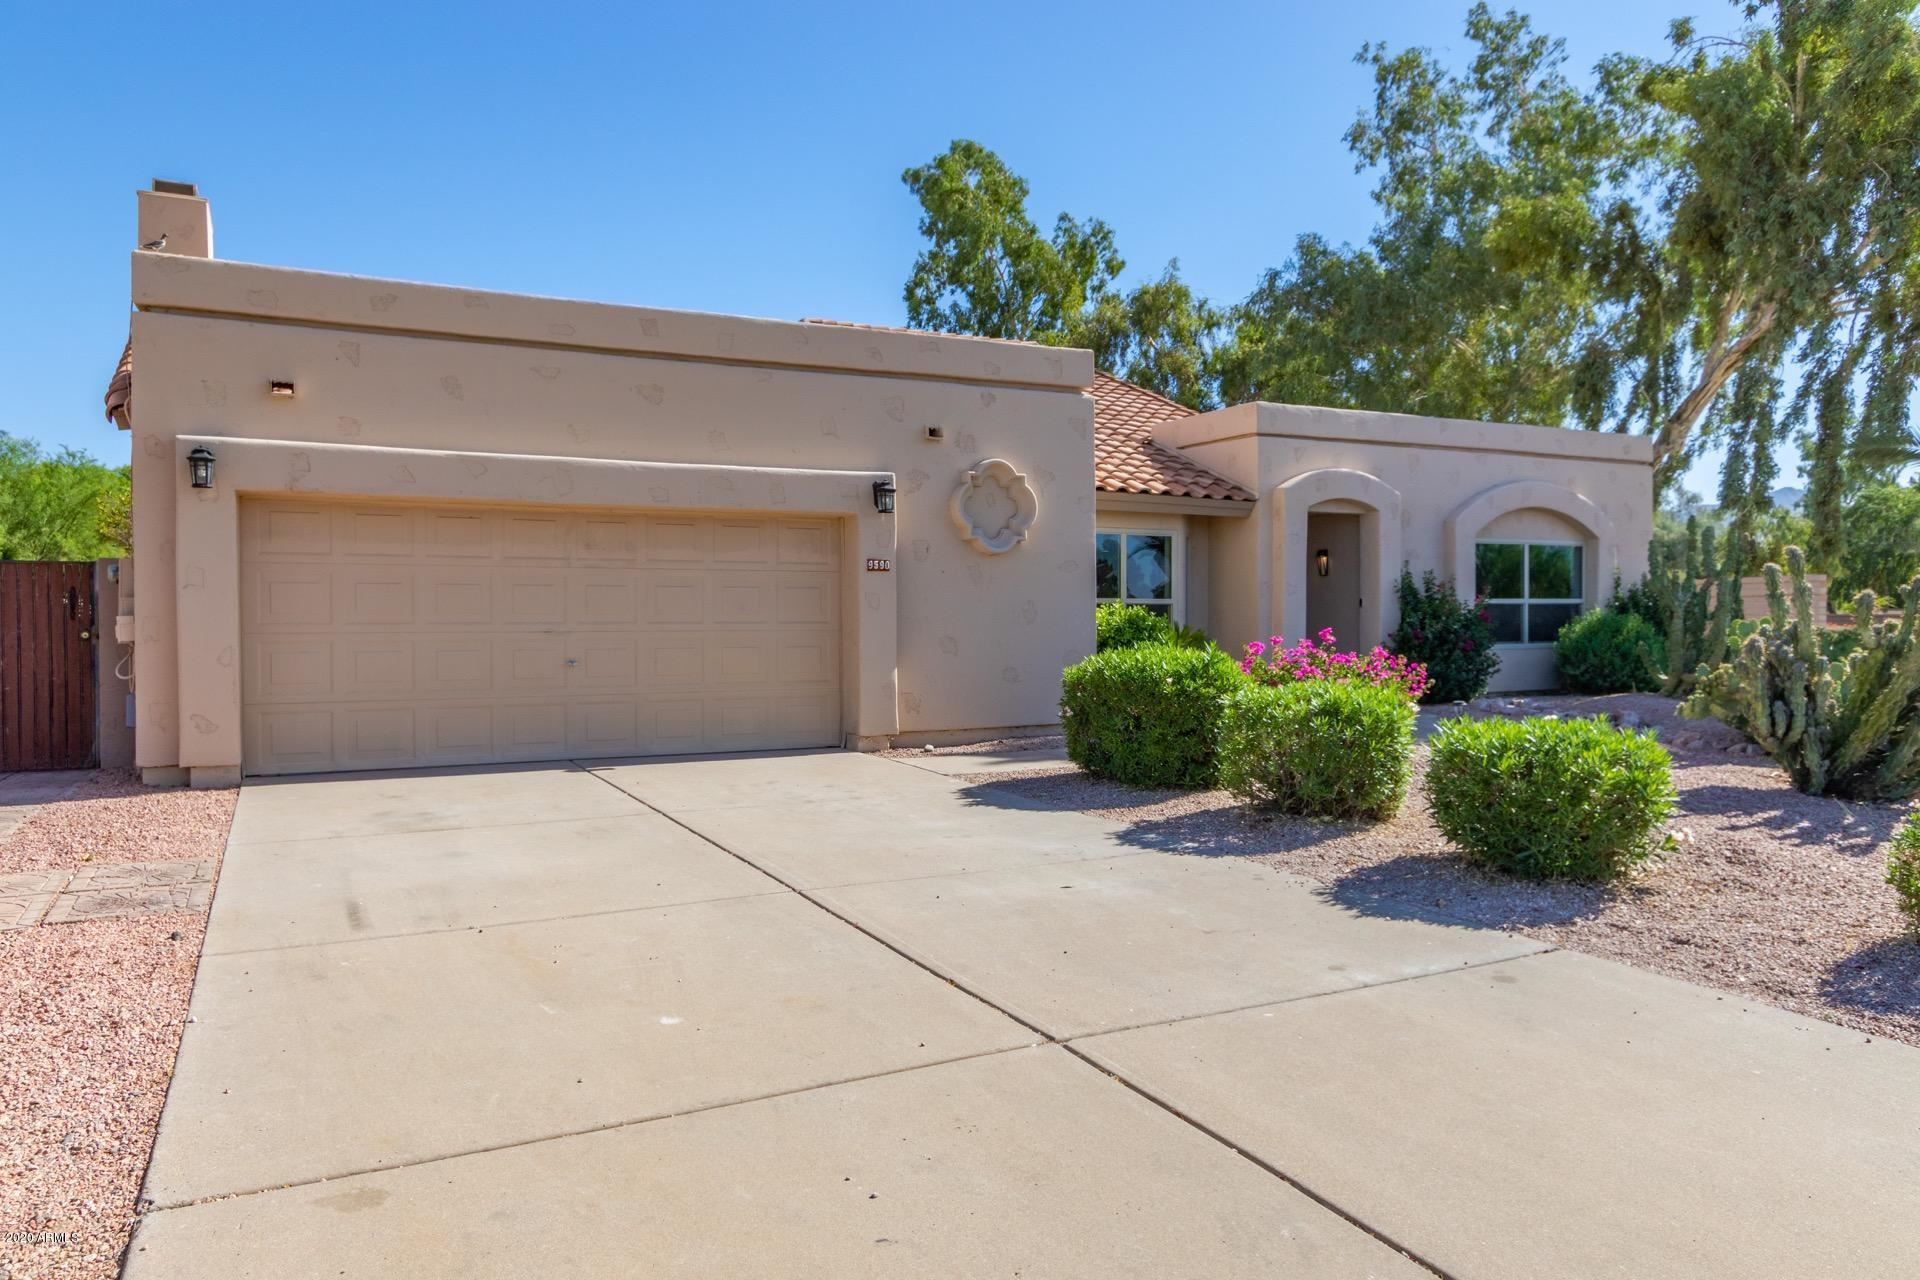 9590 E LARKSPUR Drive, Scottsdale, AZ 85260 - #: 6098434